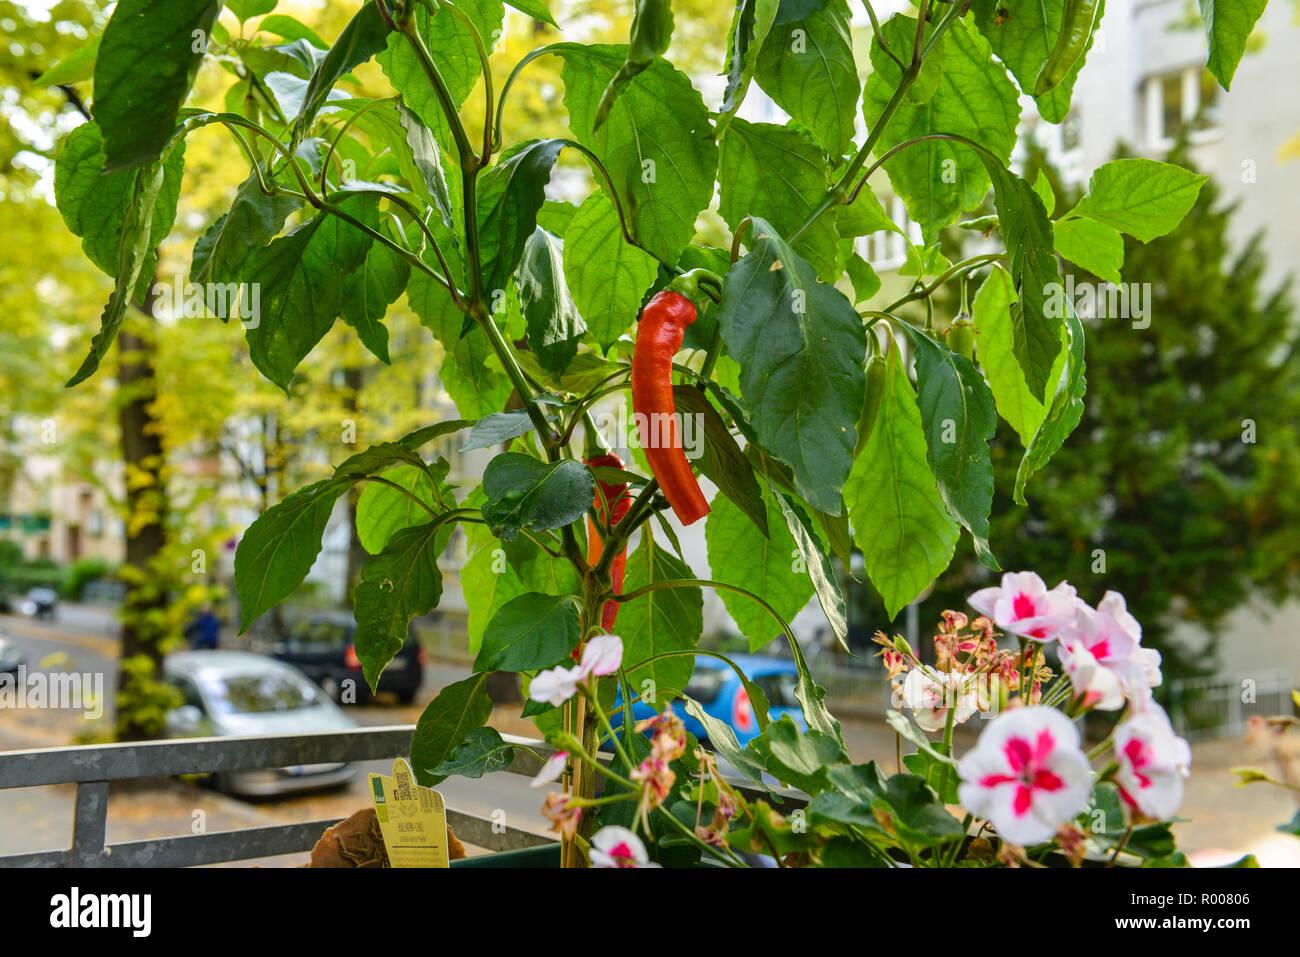 Ganz und zu Extrem Paprika Pflanze Stock Photos & Paprika Pflanze Stock Images - Alamy &AJ_86